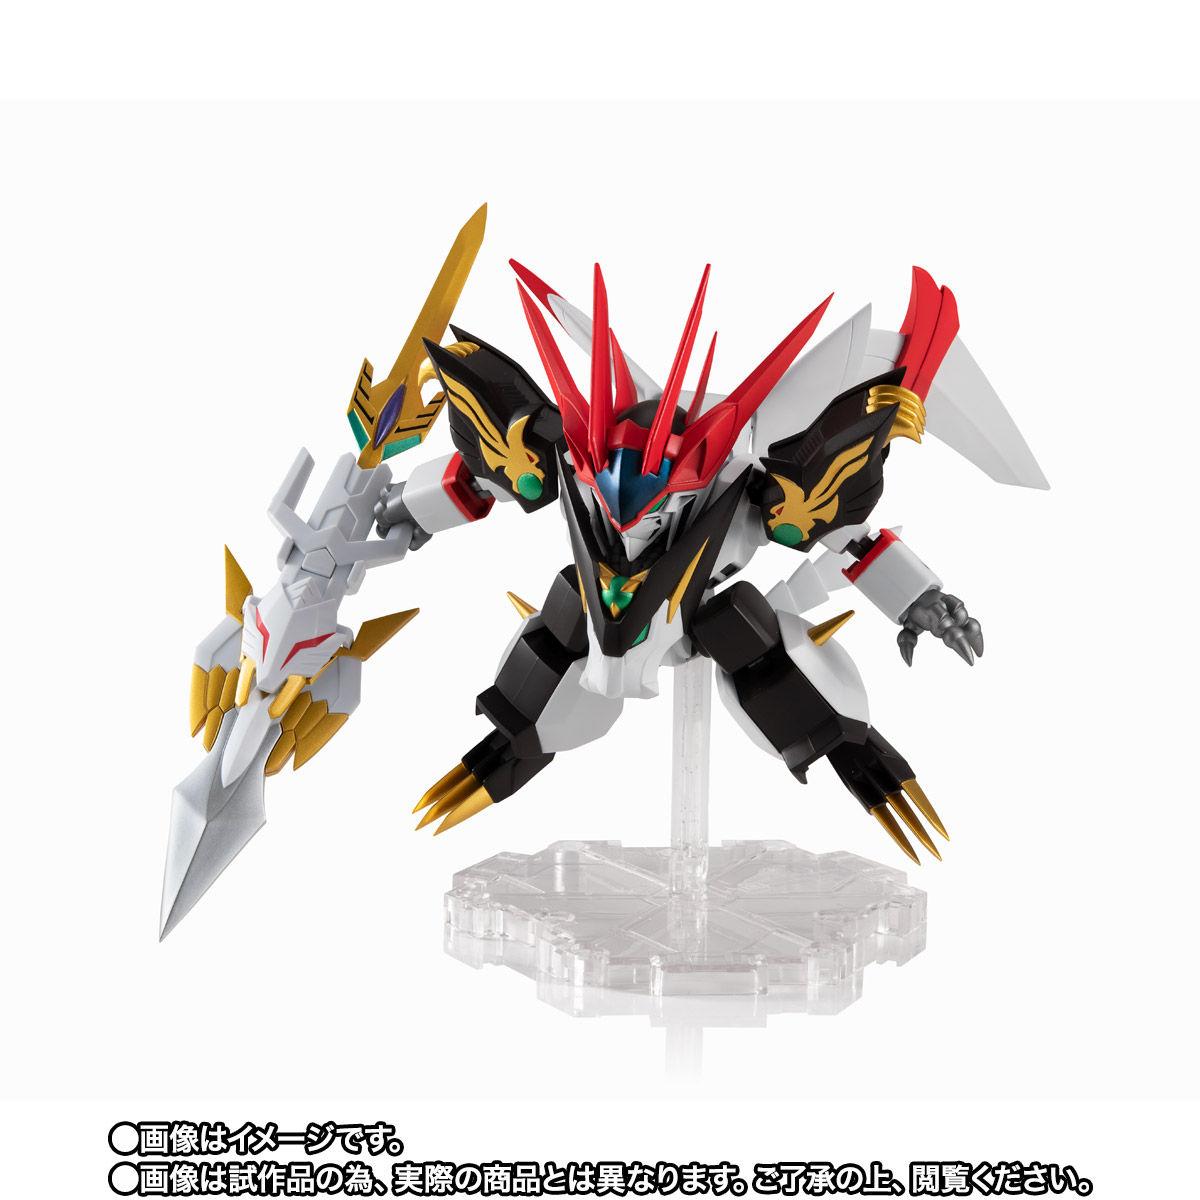 NXEDGE STYLE[MASHIN UNIT]『白虎丸』魔神英雄伝ワタル 可動フィギュア-003